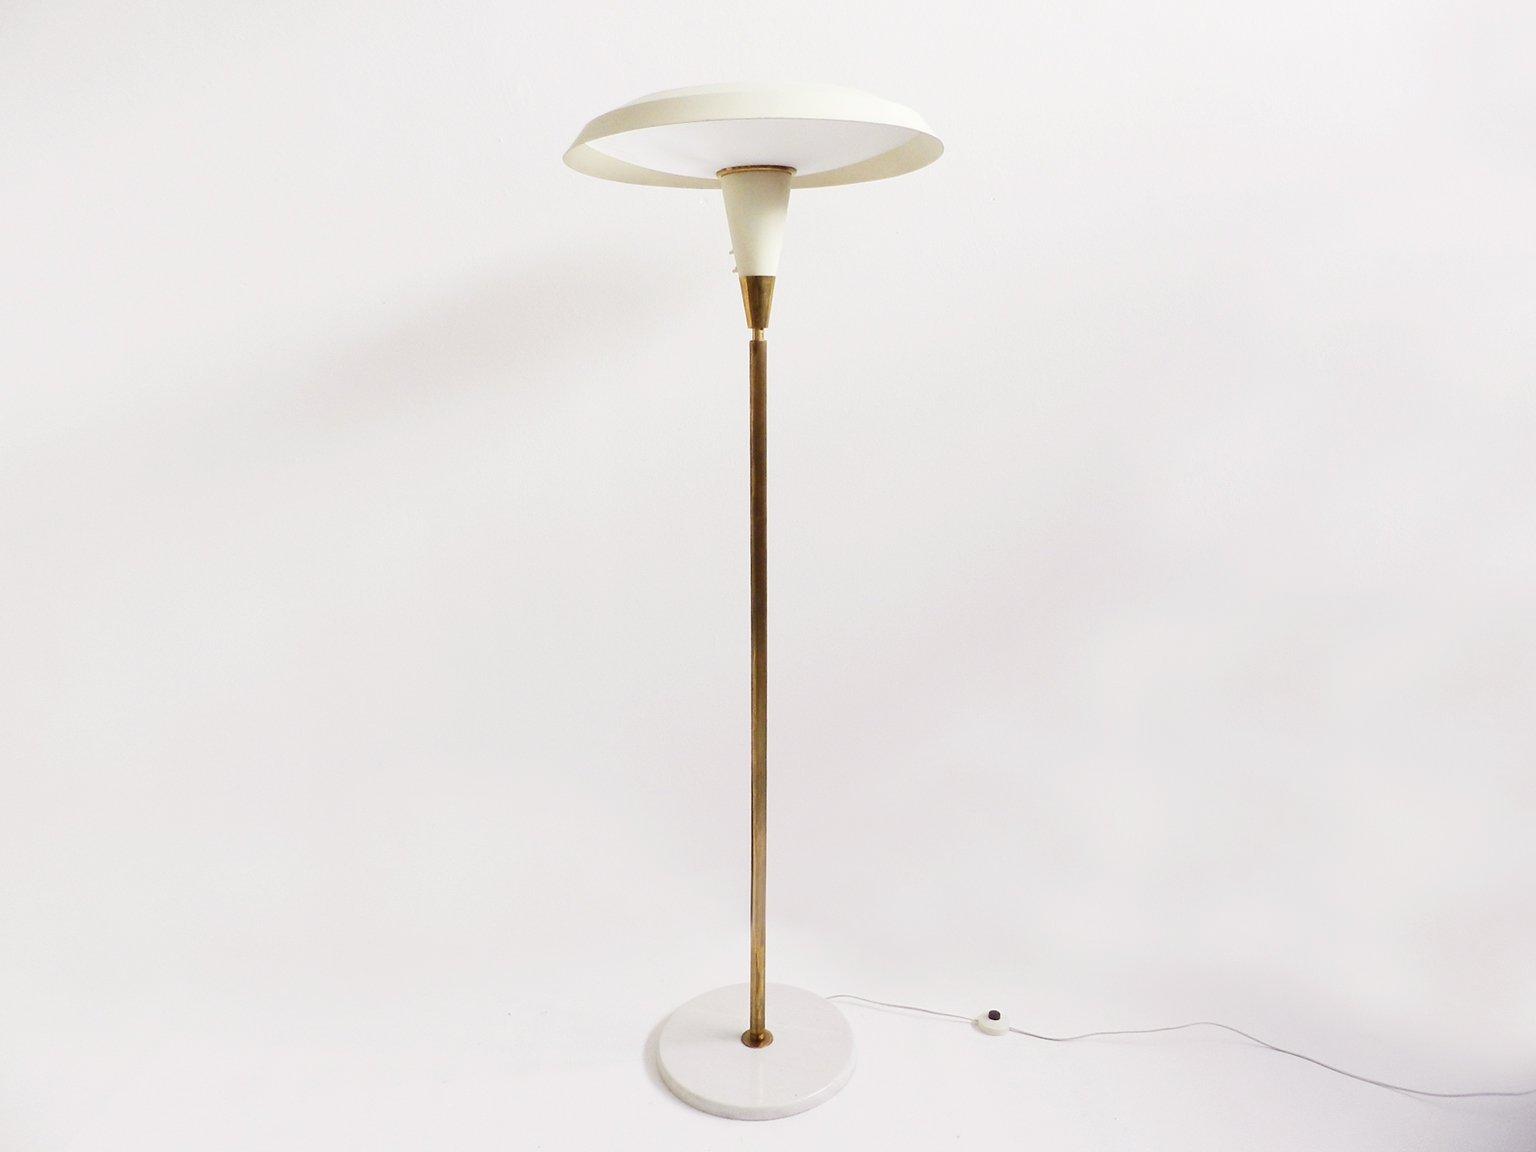 wei e vintage mid century stehlampe bei pamono kaufen. Black Bedroom Furniture Sets. Home Design Ideas